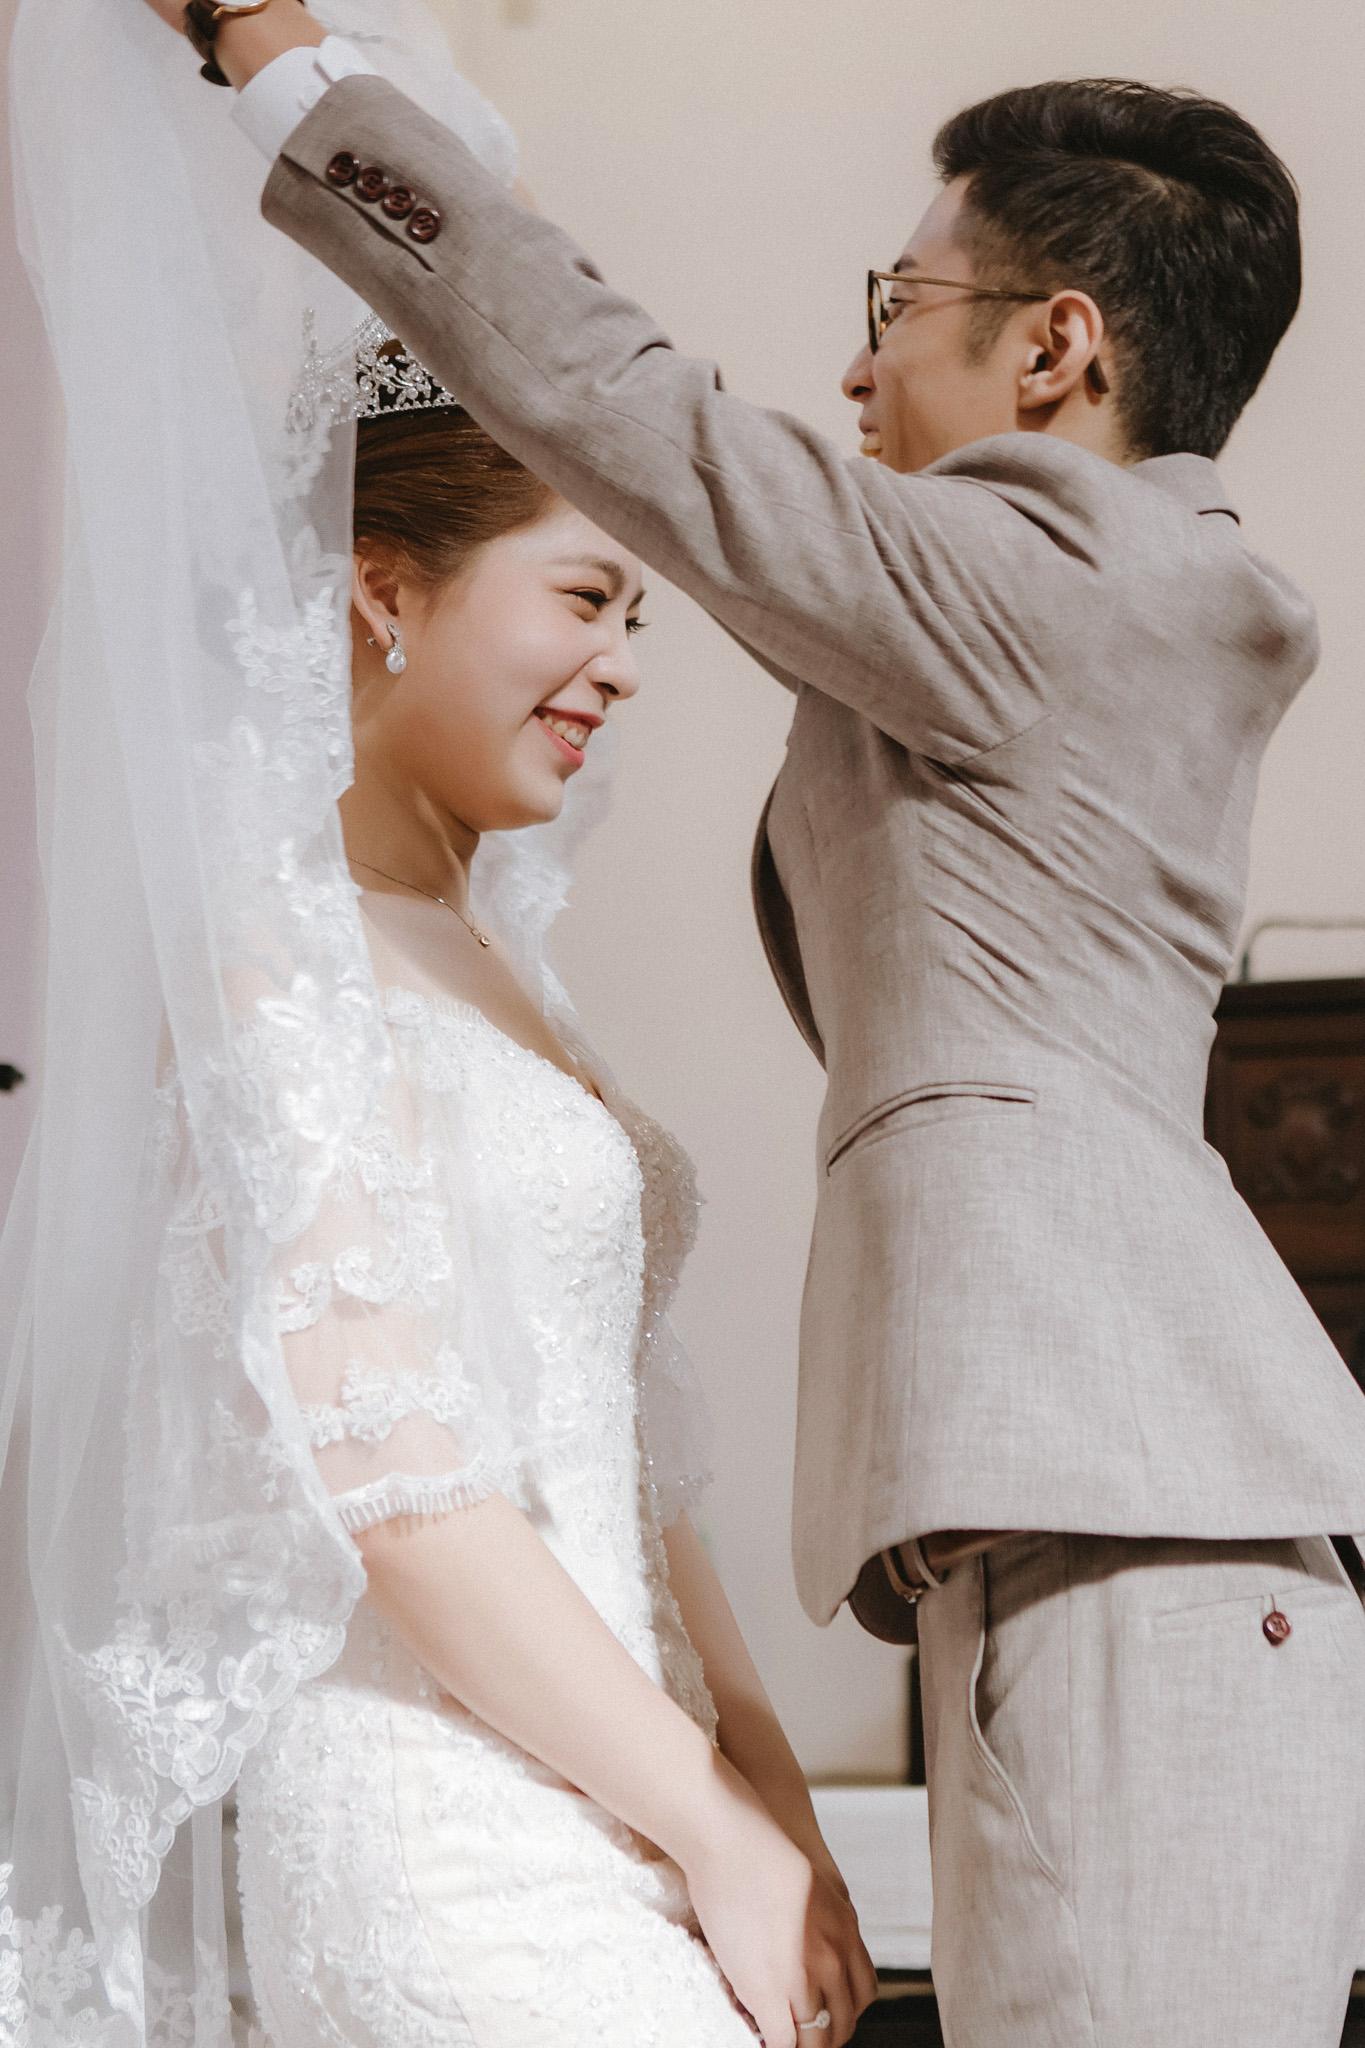 EW 台北婚攝 居米 濟南教會 Brick Yard 33 美軍俱樂部 婚禮 婚宴-32